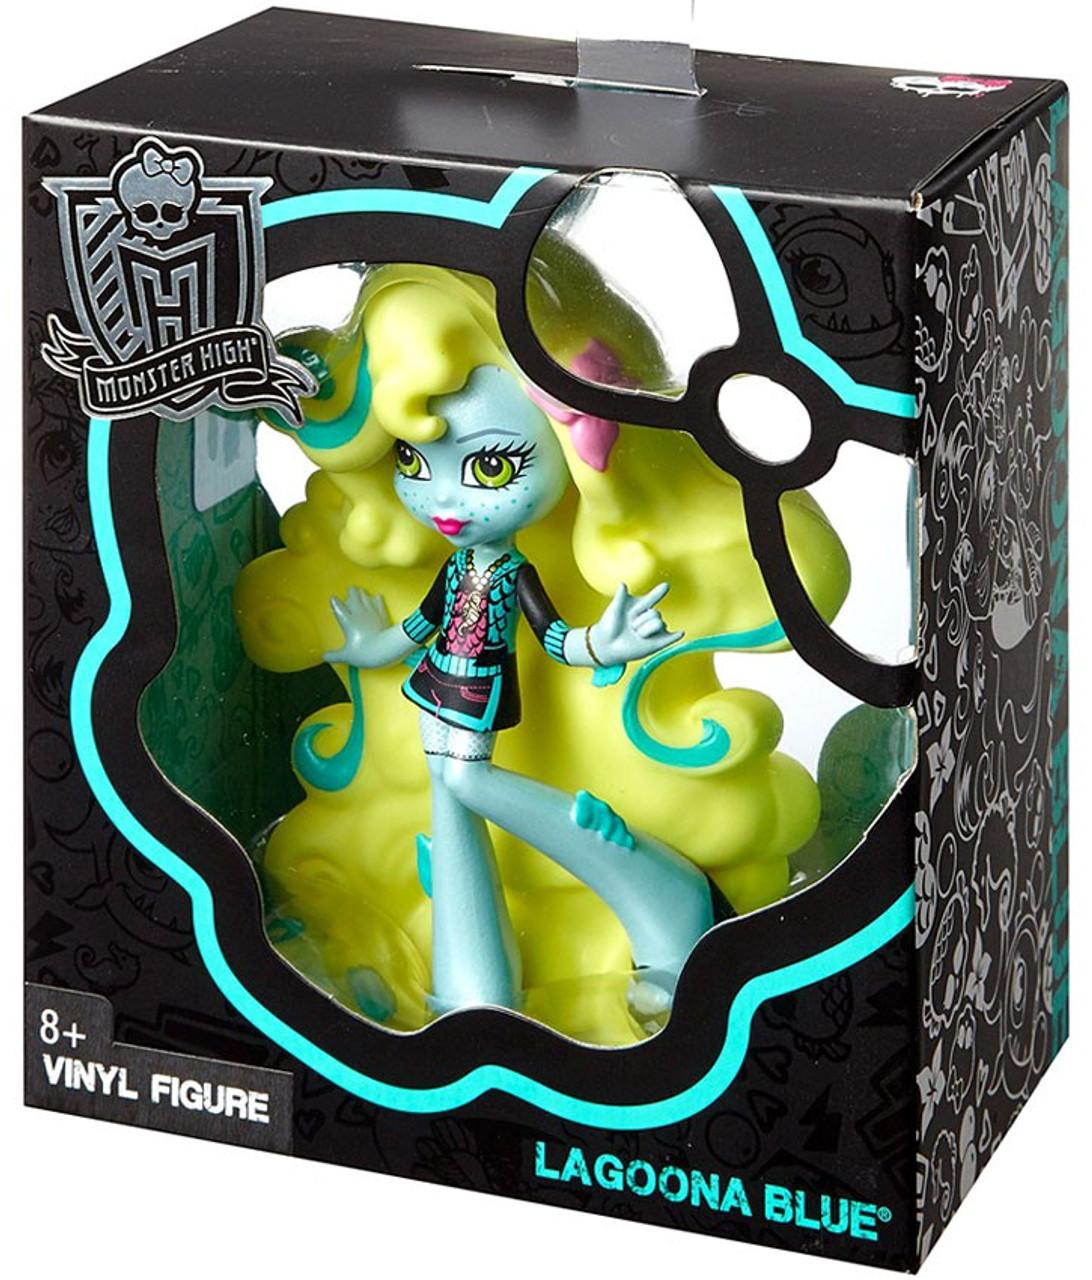 Monster High Lagoona Blue Vinyl Figure Mattel Toys  ToyWiz